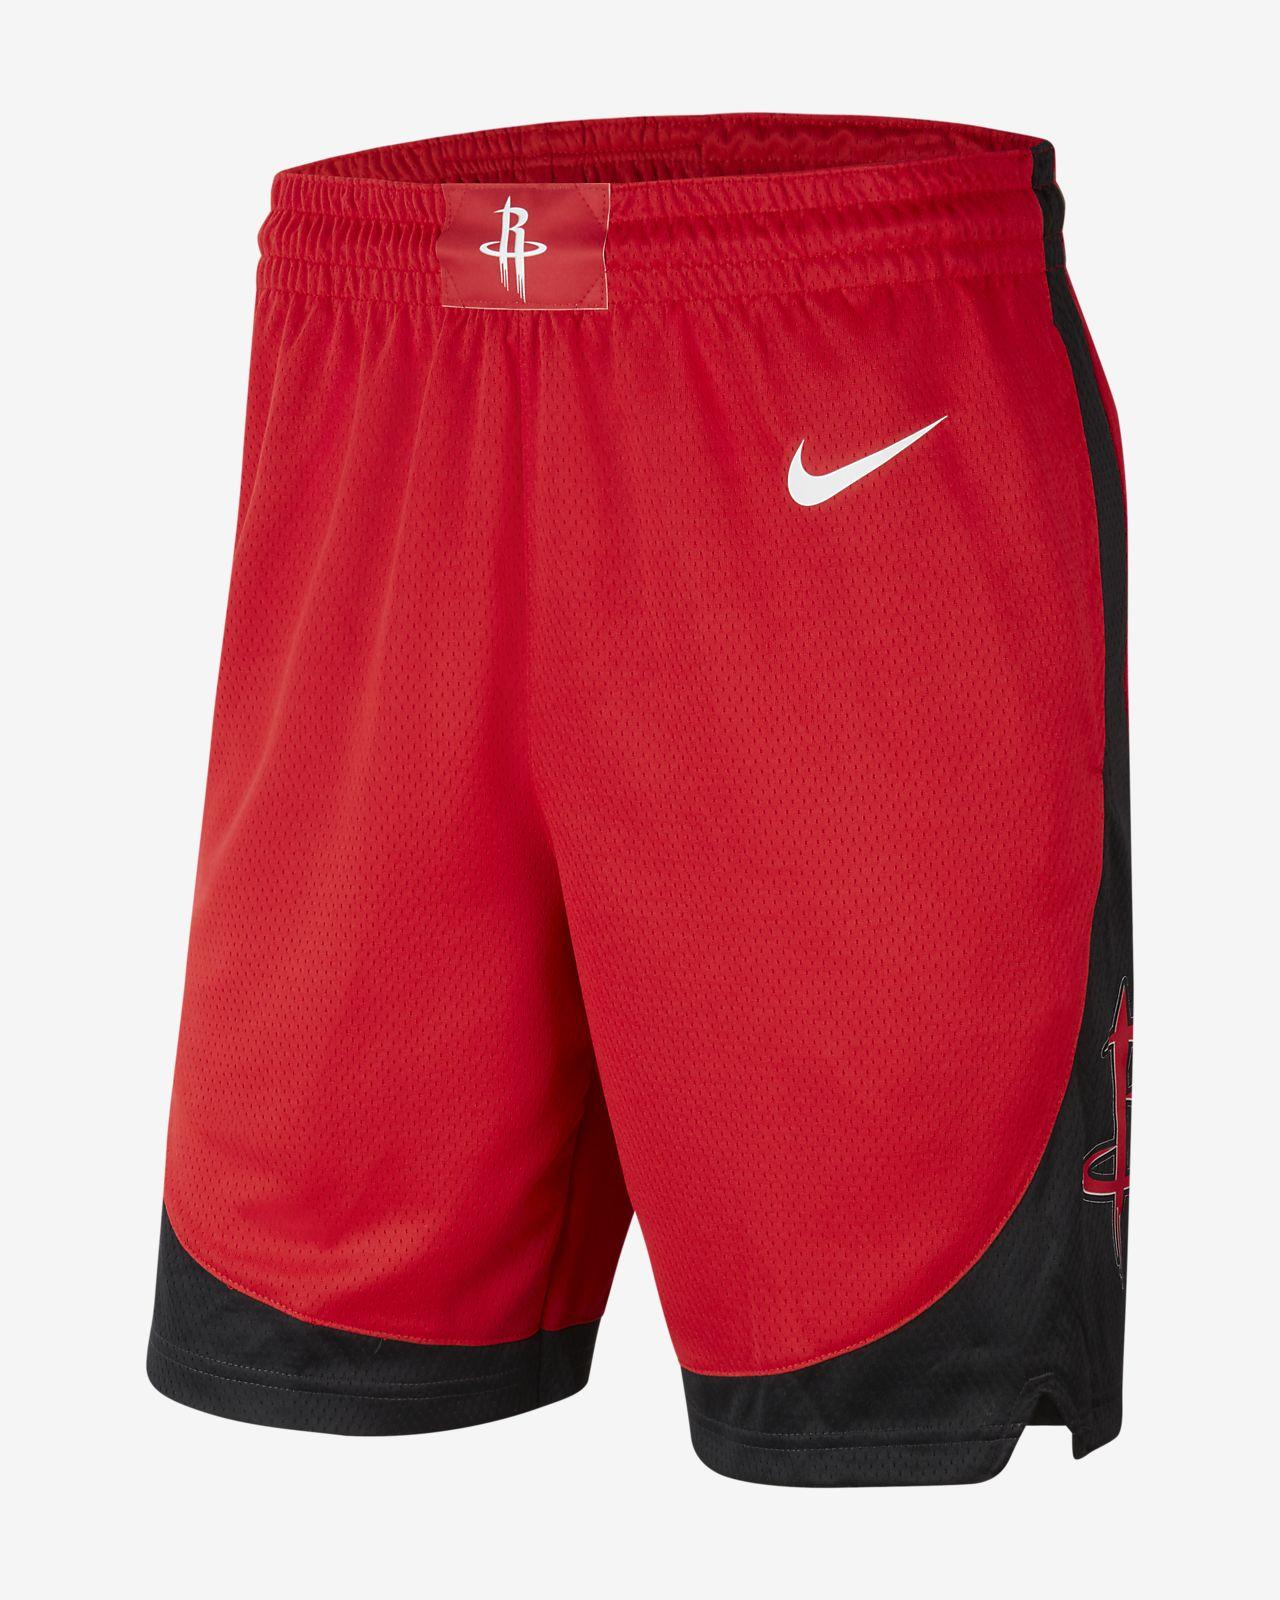 Men's Houston Rockets Nike 2019 City Edition Courtside